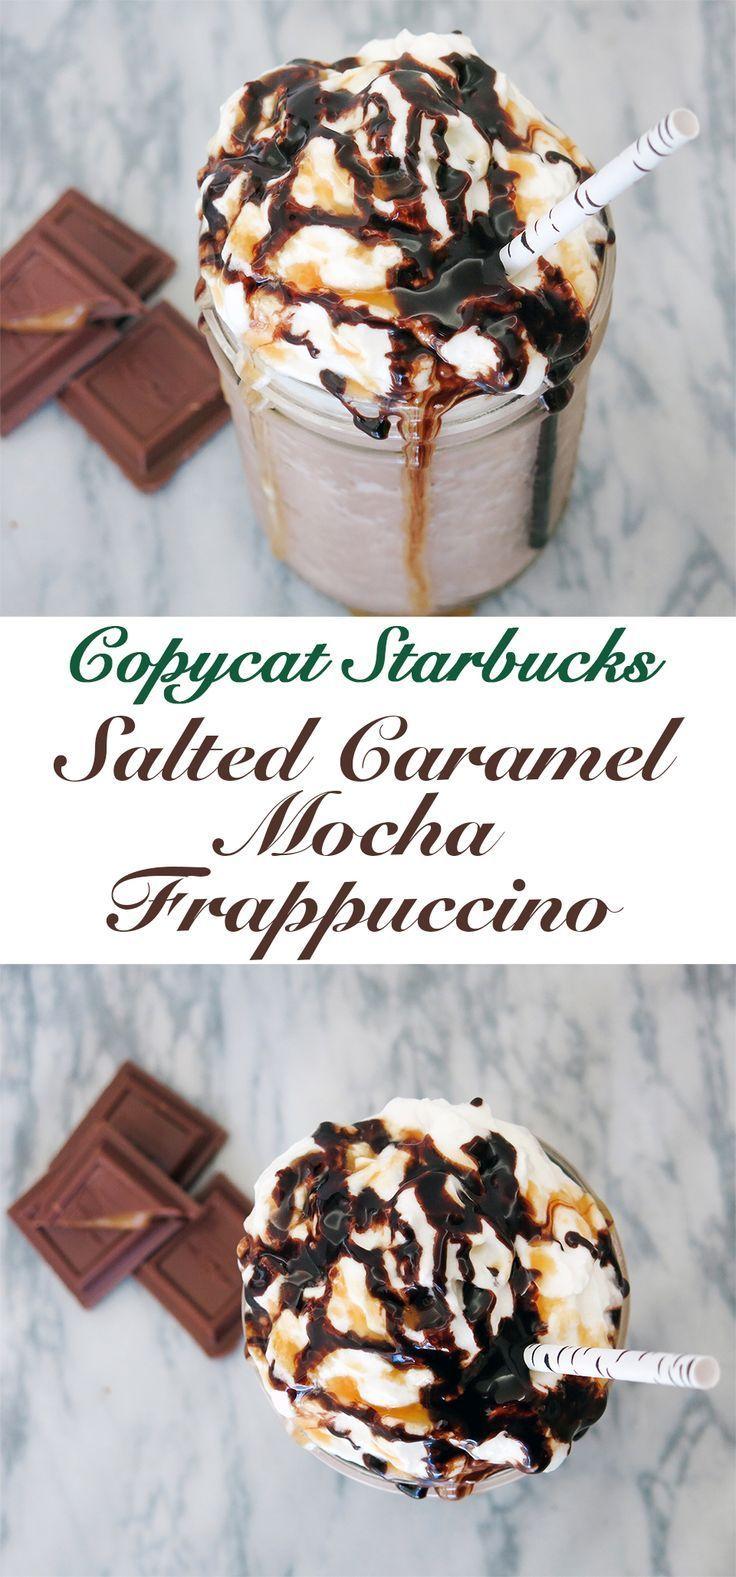 Salted Caramel Mocha Frappuccino Recipe #ketofrappucinostarbucks